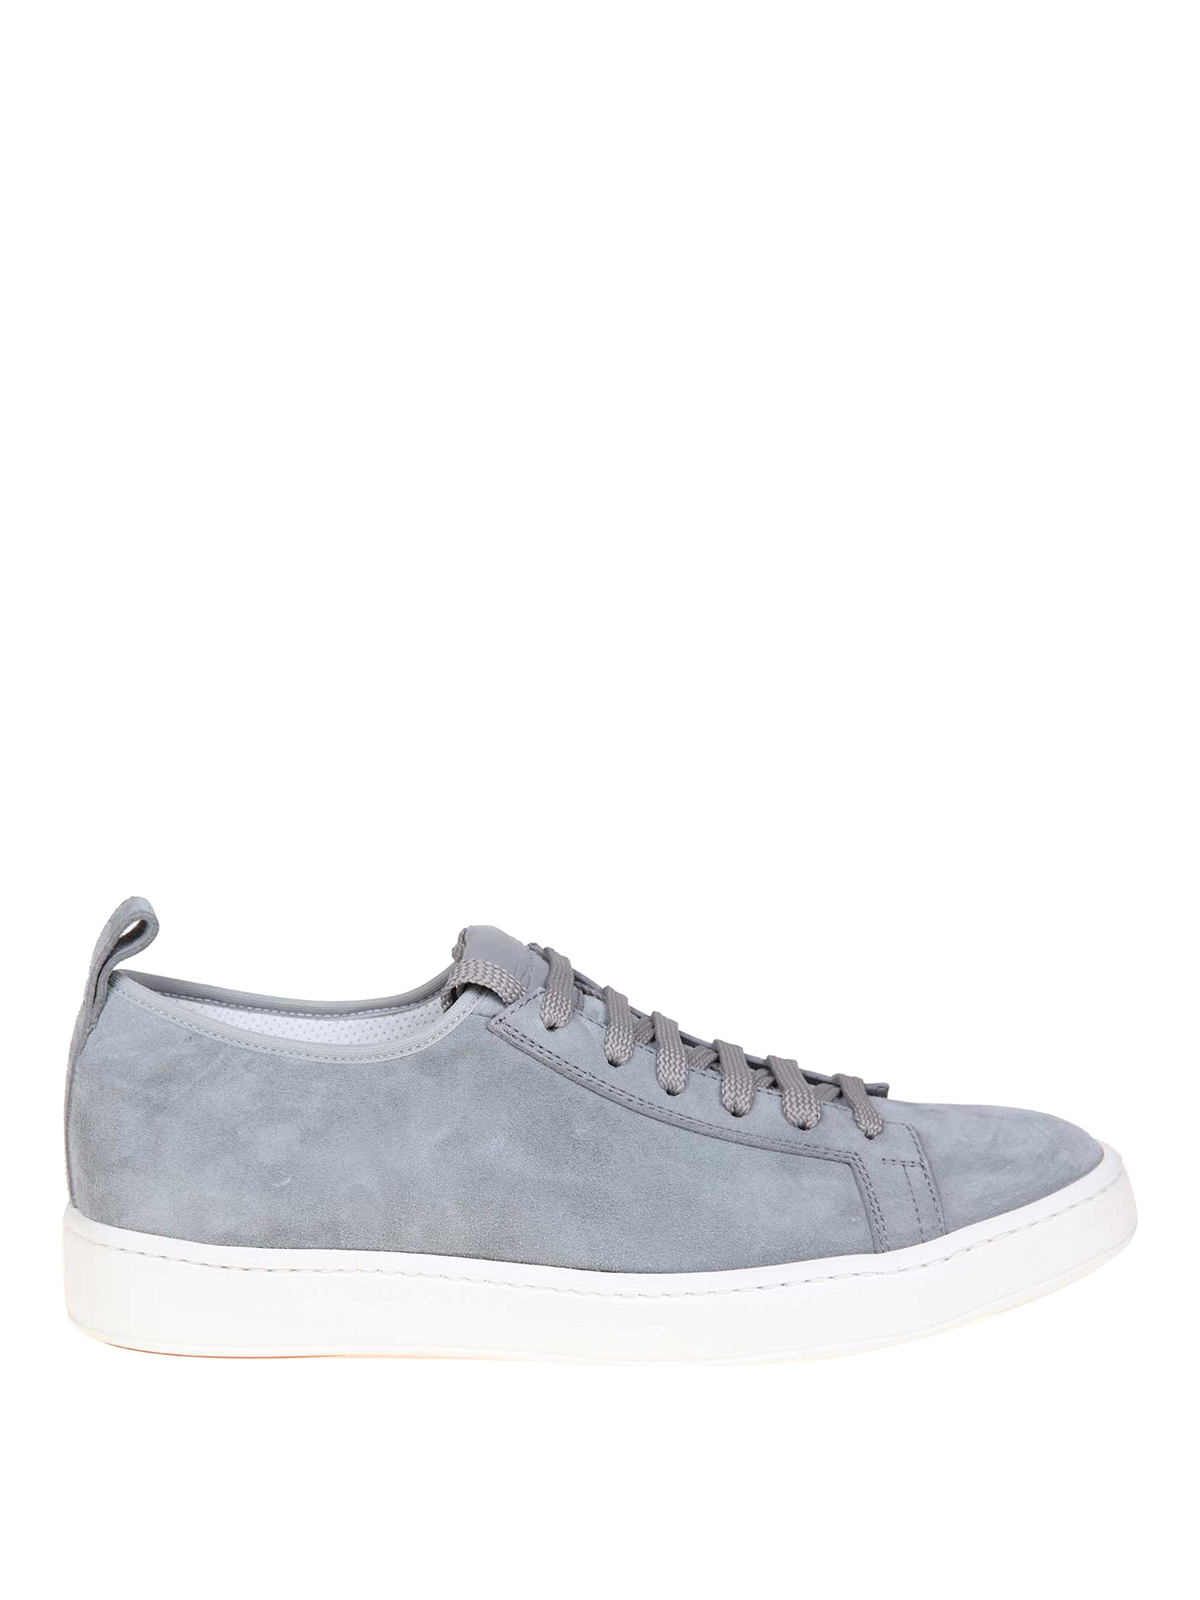 Santoni - Grey suede low top sneakers